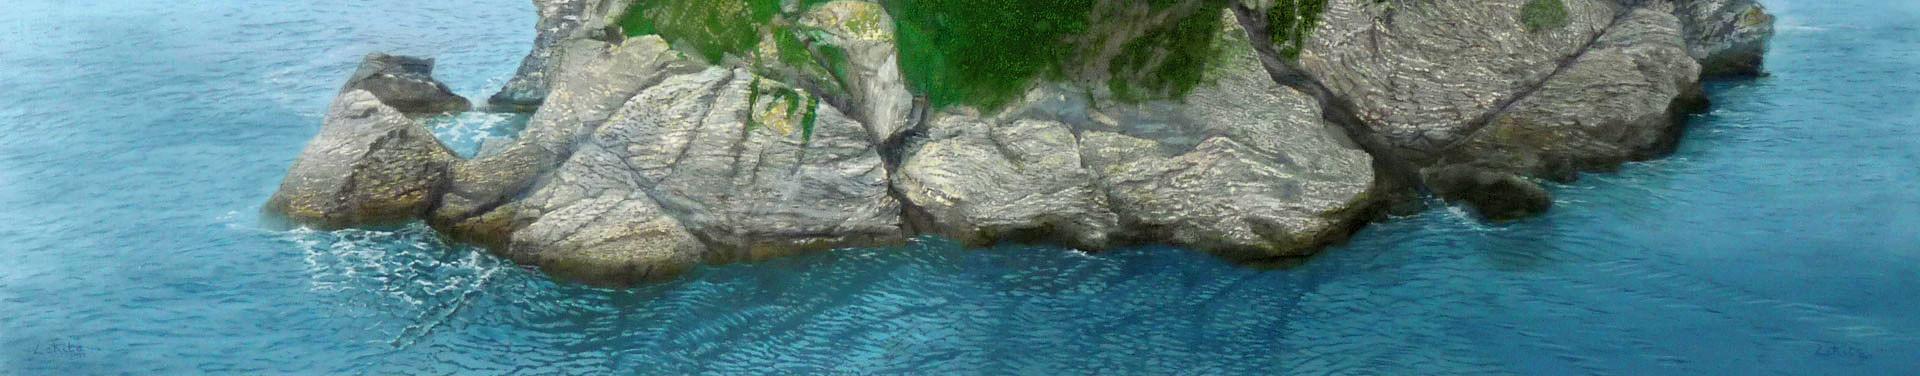 Bannière mer - Lakita Peintures